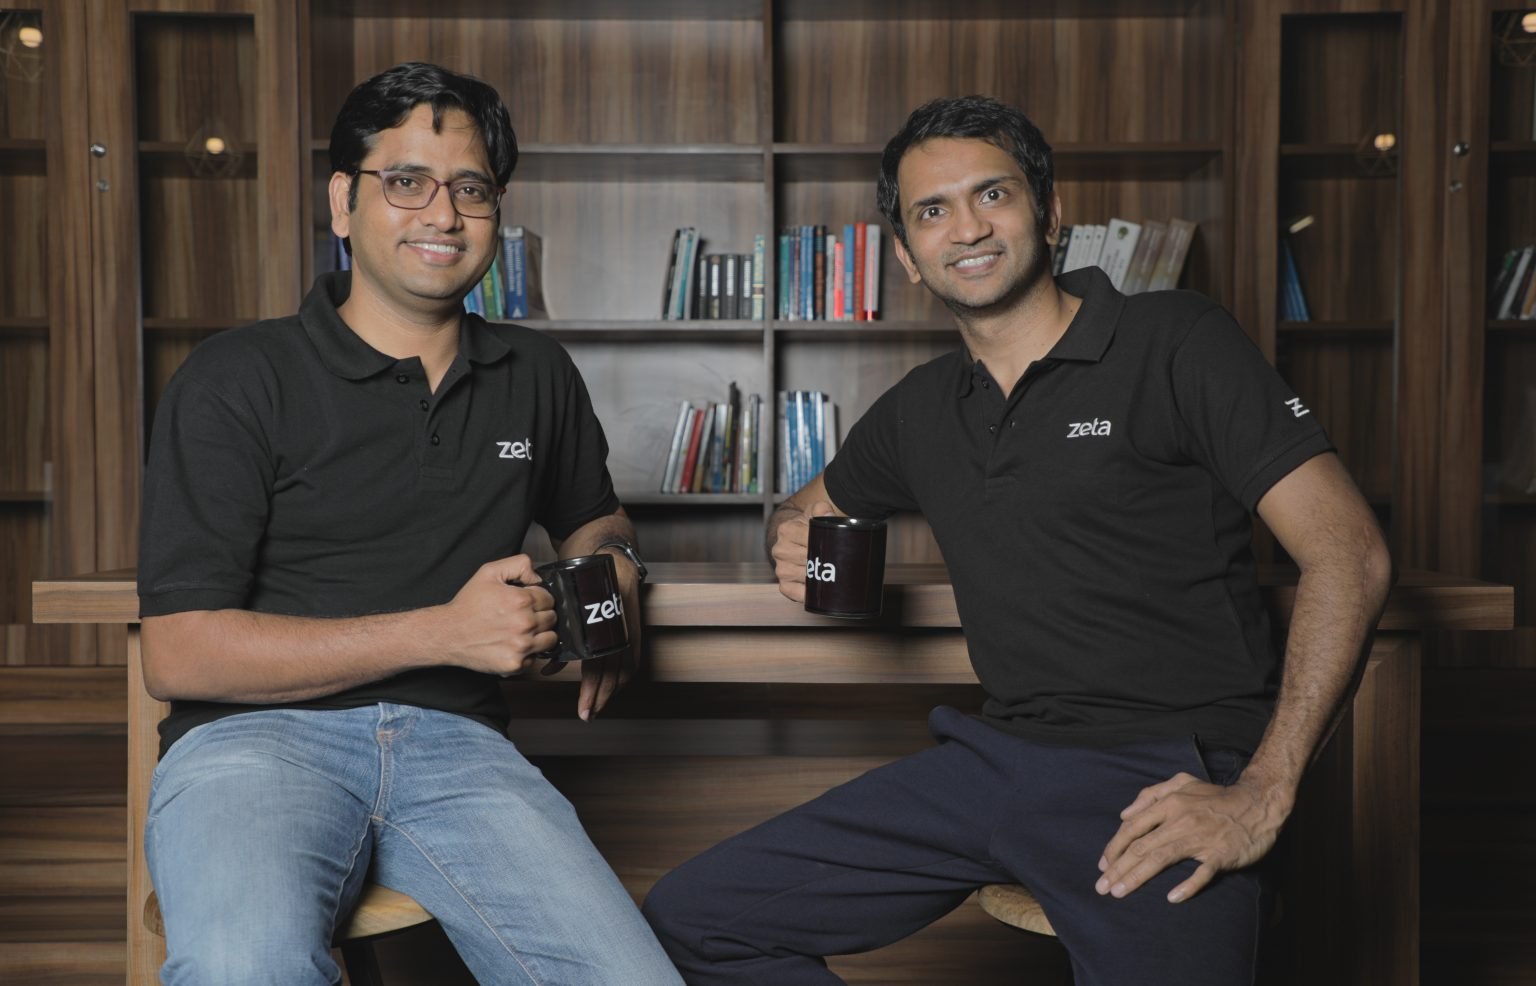 Zeta becomes 14th Indian unicorn this year after SoftBank funding | സോഫ്റ്റ്ബാങ്ക് ഫണ്ടിംഗിന് ശേഷം ഈ വർഷം പതിനാലാമത്തെ ഇന്ത്യൻ യൂണികോൺ ആയി സീറ്റ_40.1